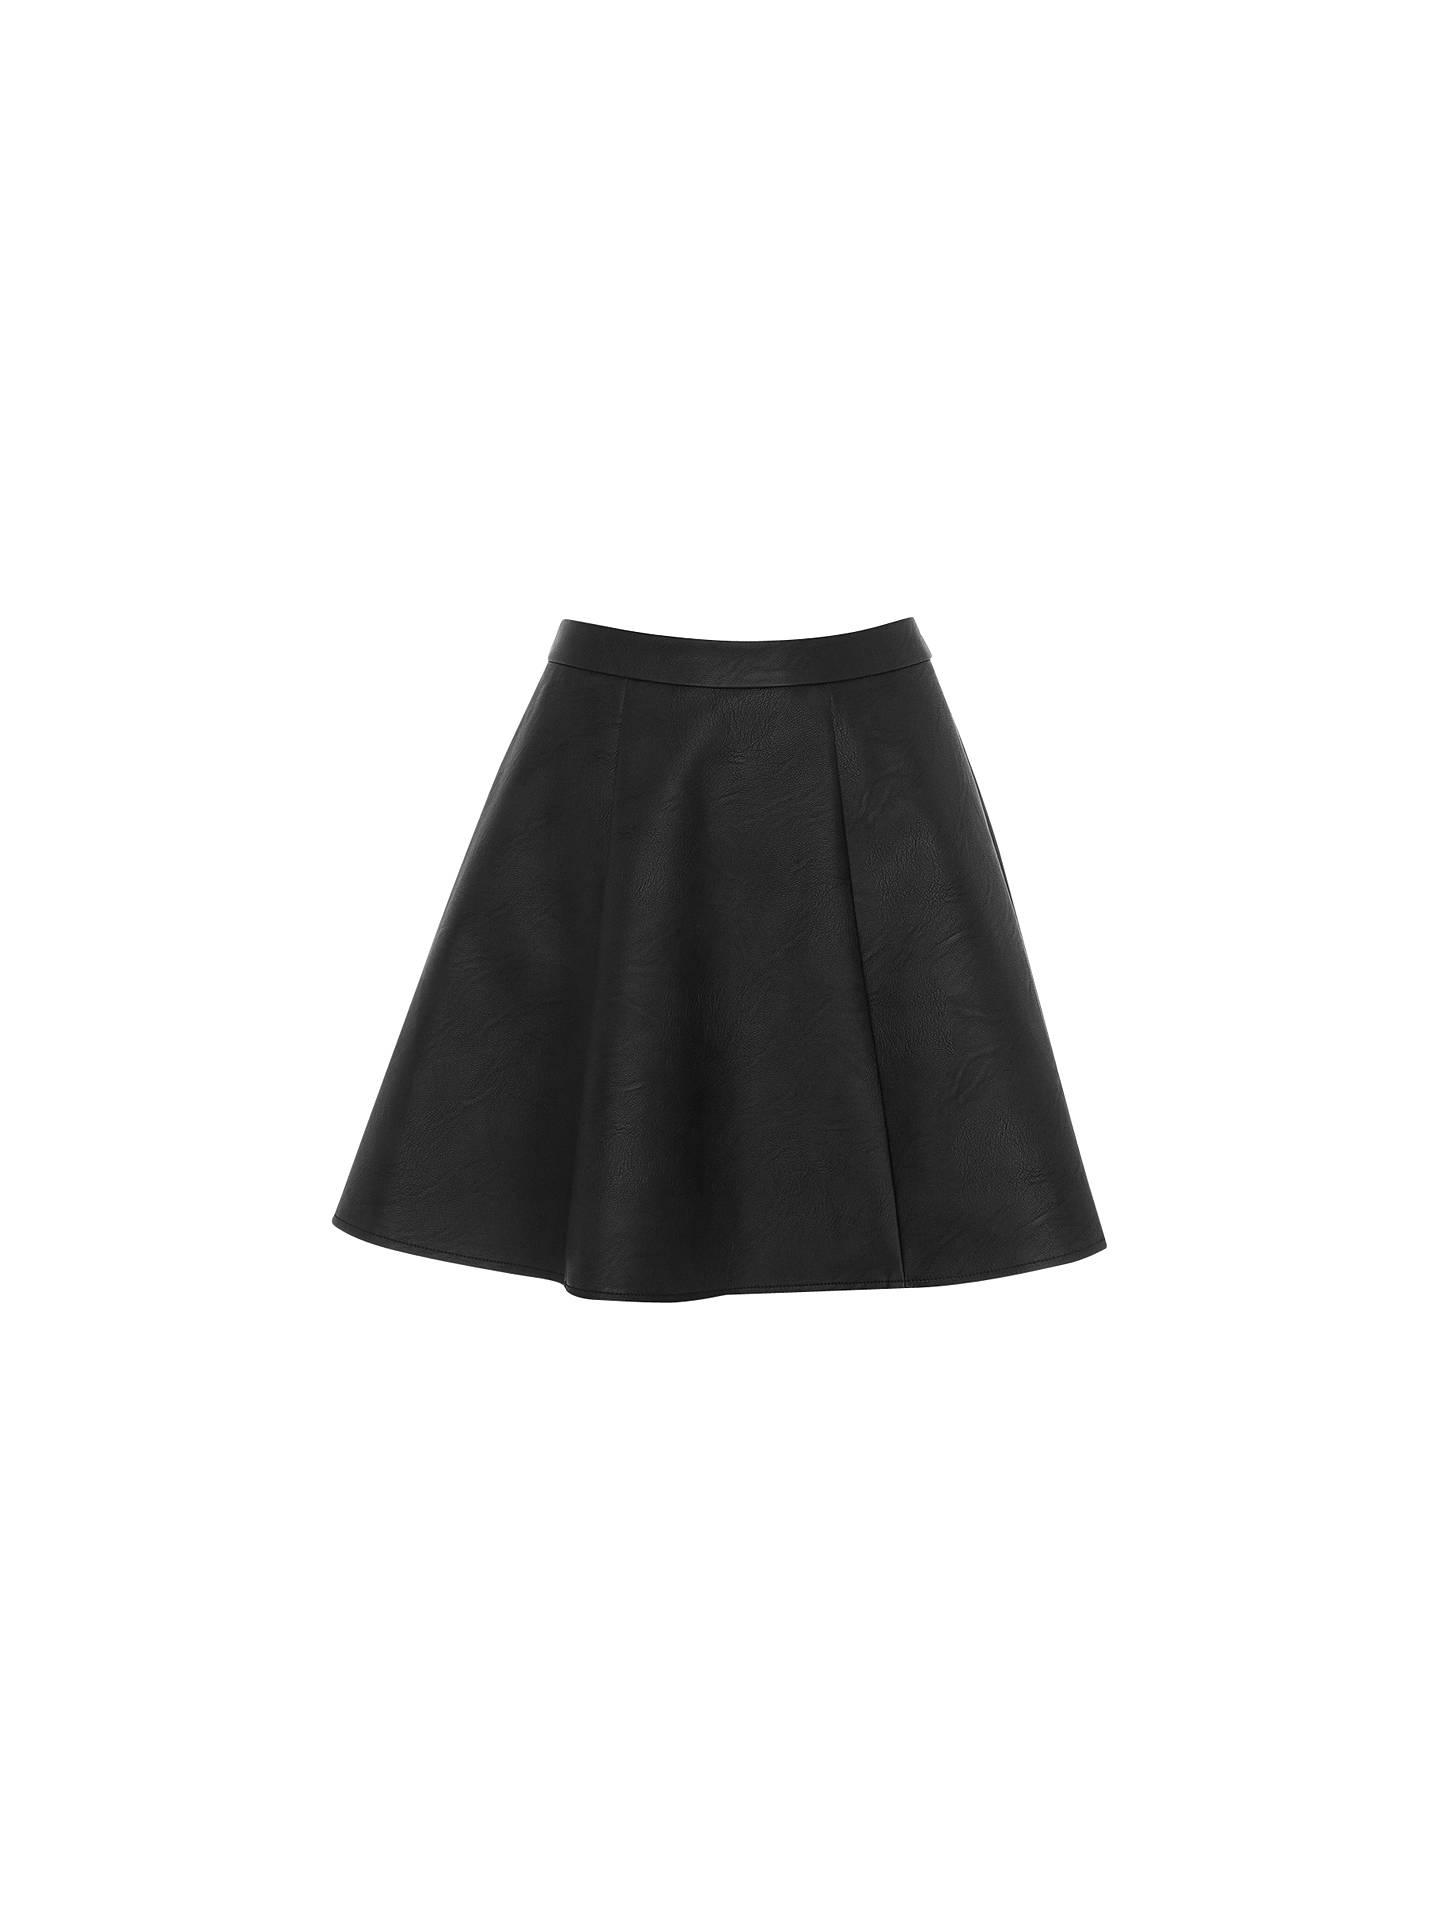 ba349327c582 Buy Oasis Bailey Faux Leather Skater Skirt, Black, 8 Online at  johnlewis.com ...